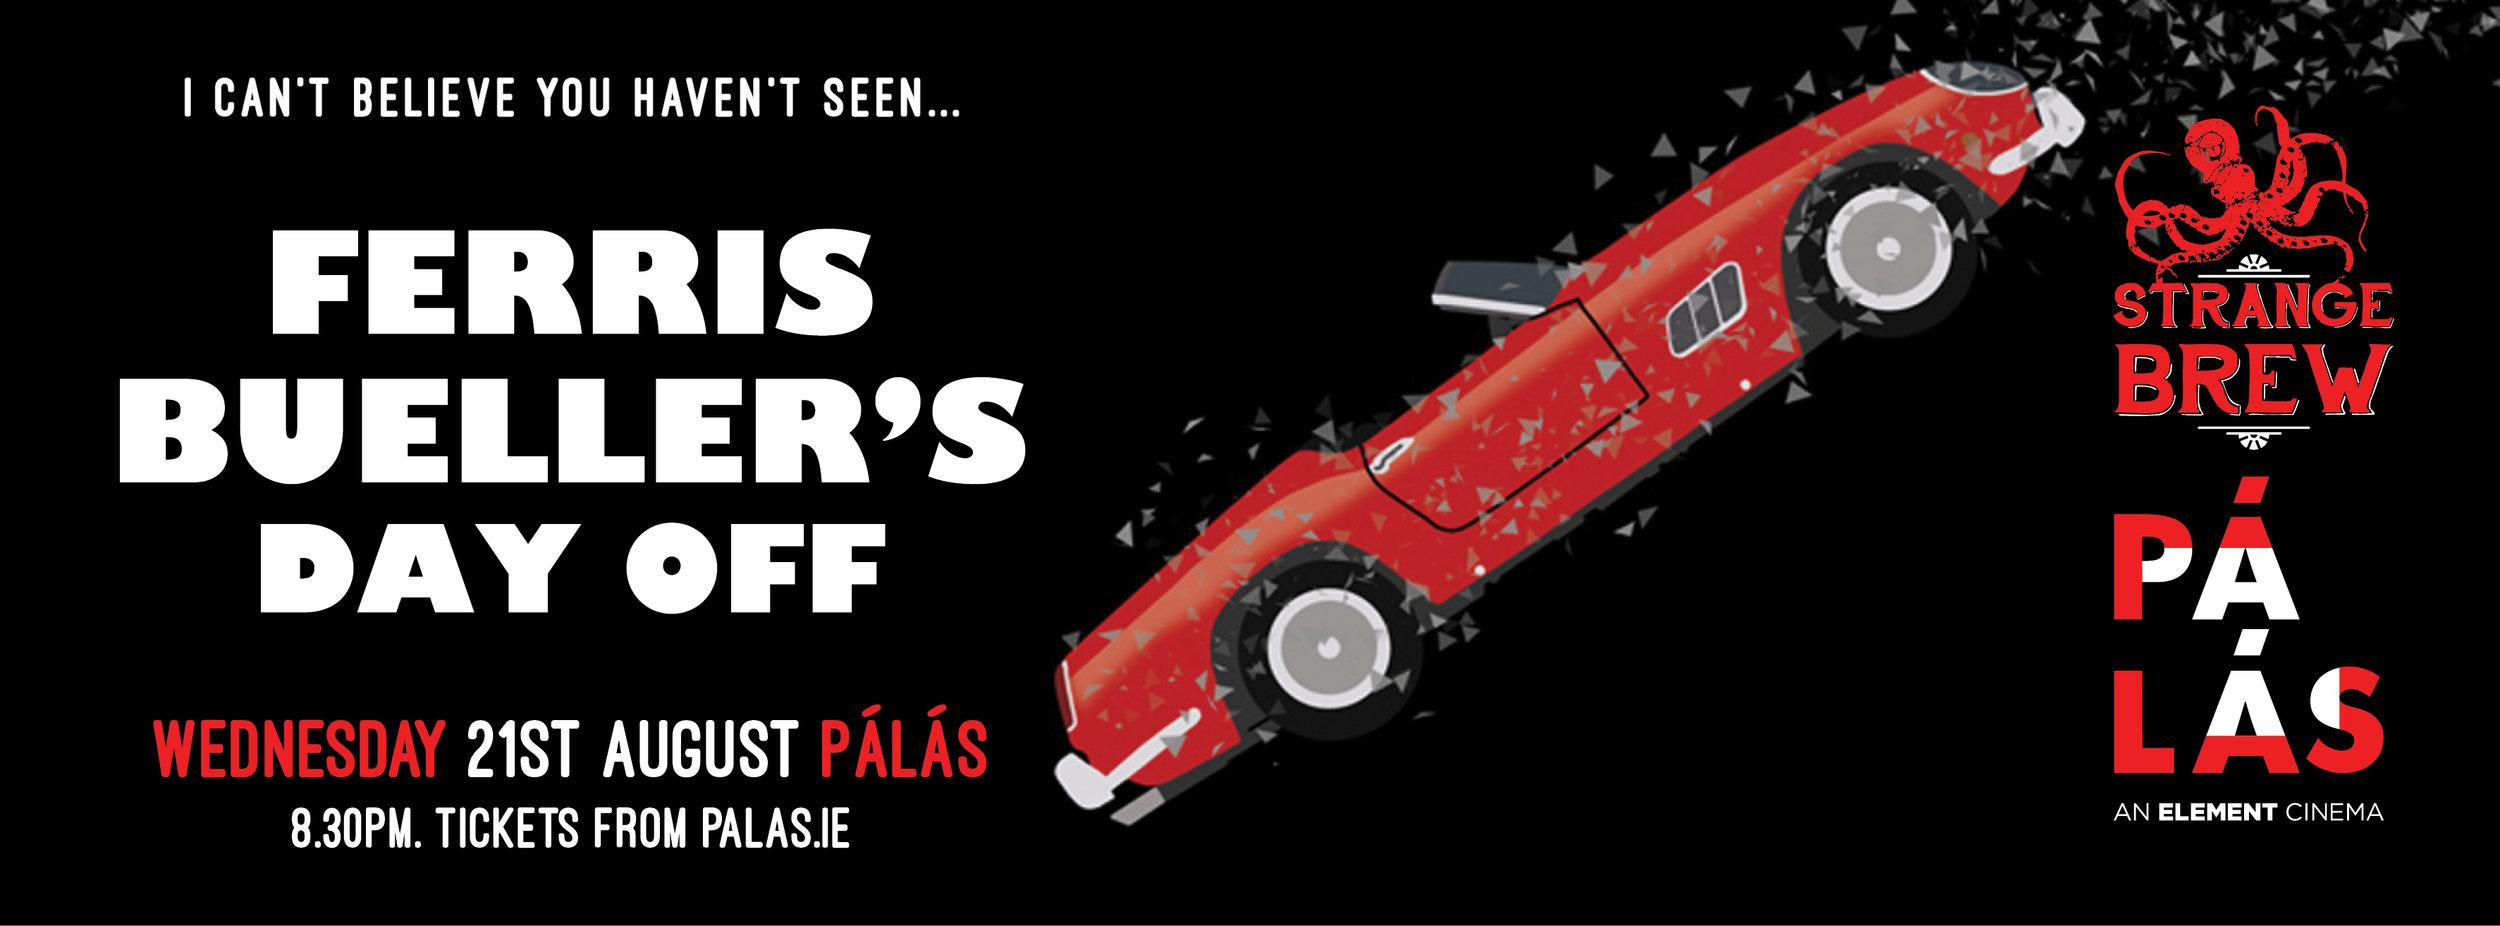 ICBYHS Ferris Beuller's Day Off FB.jpg